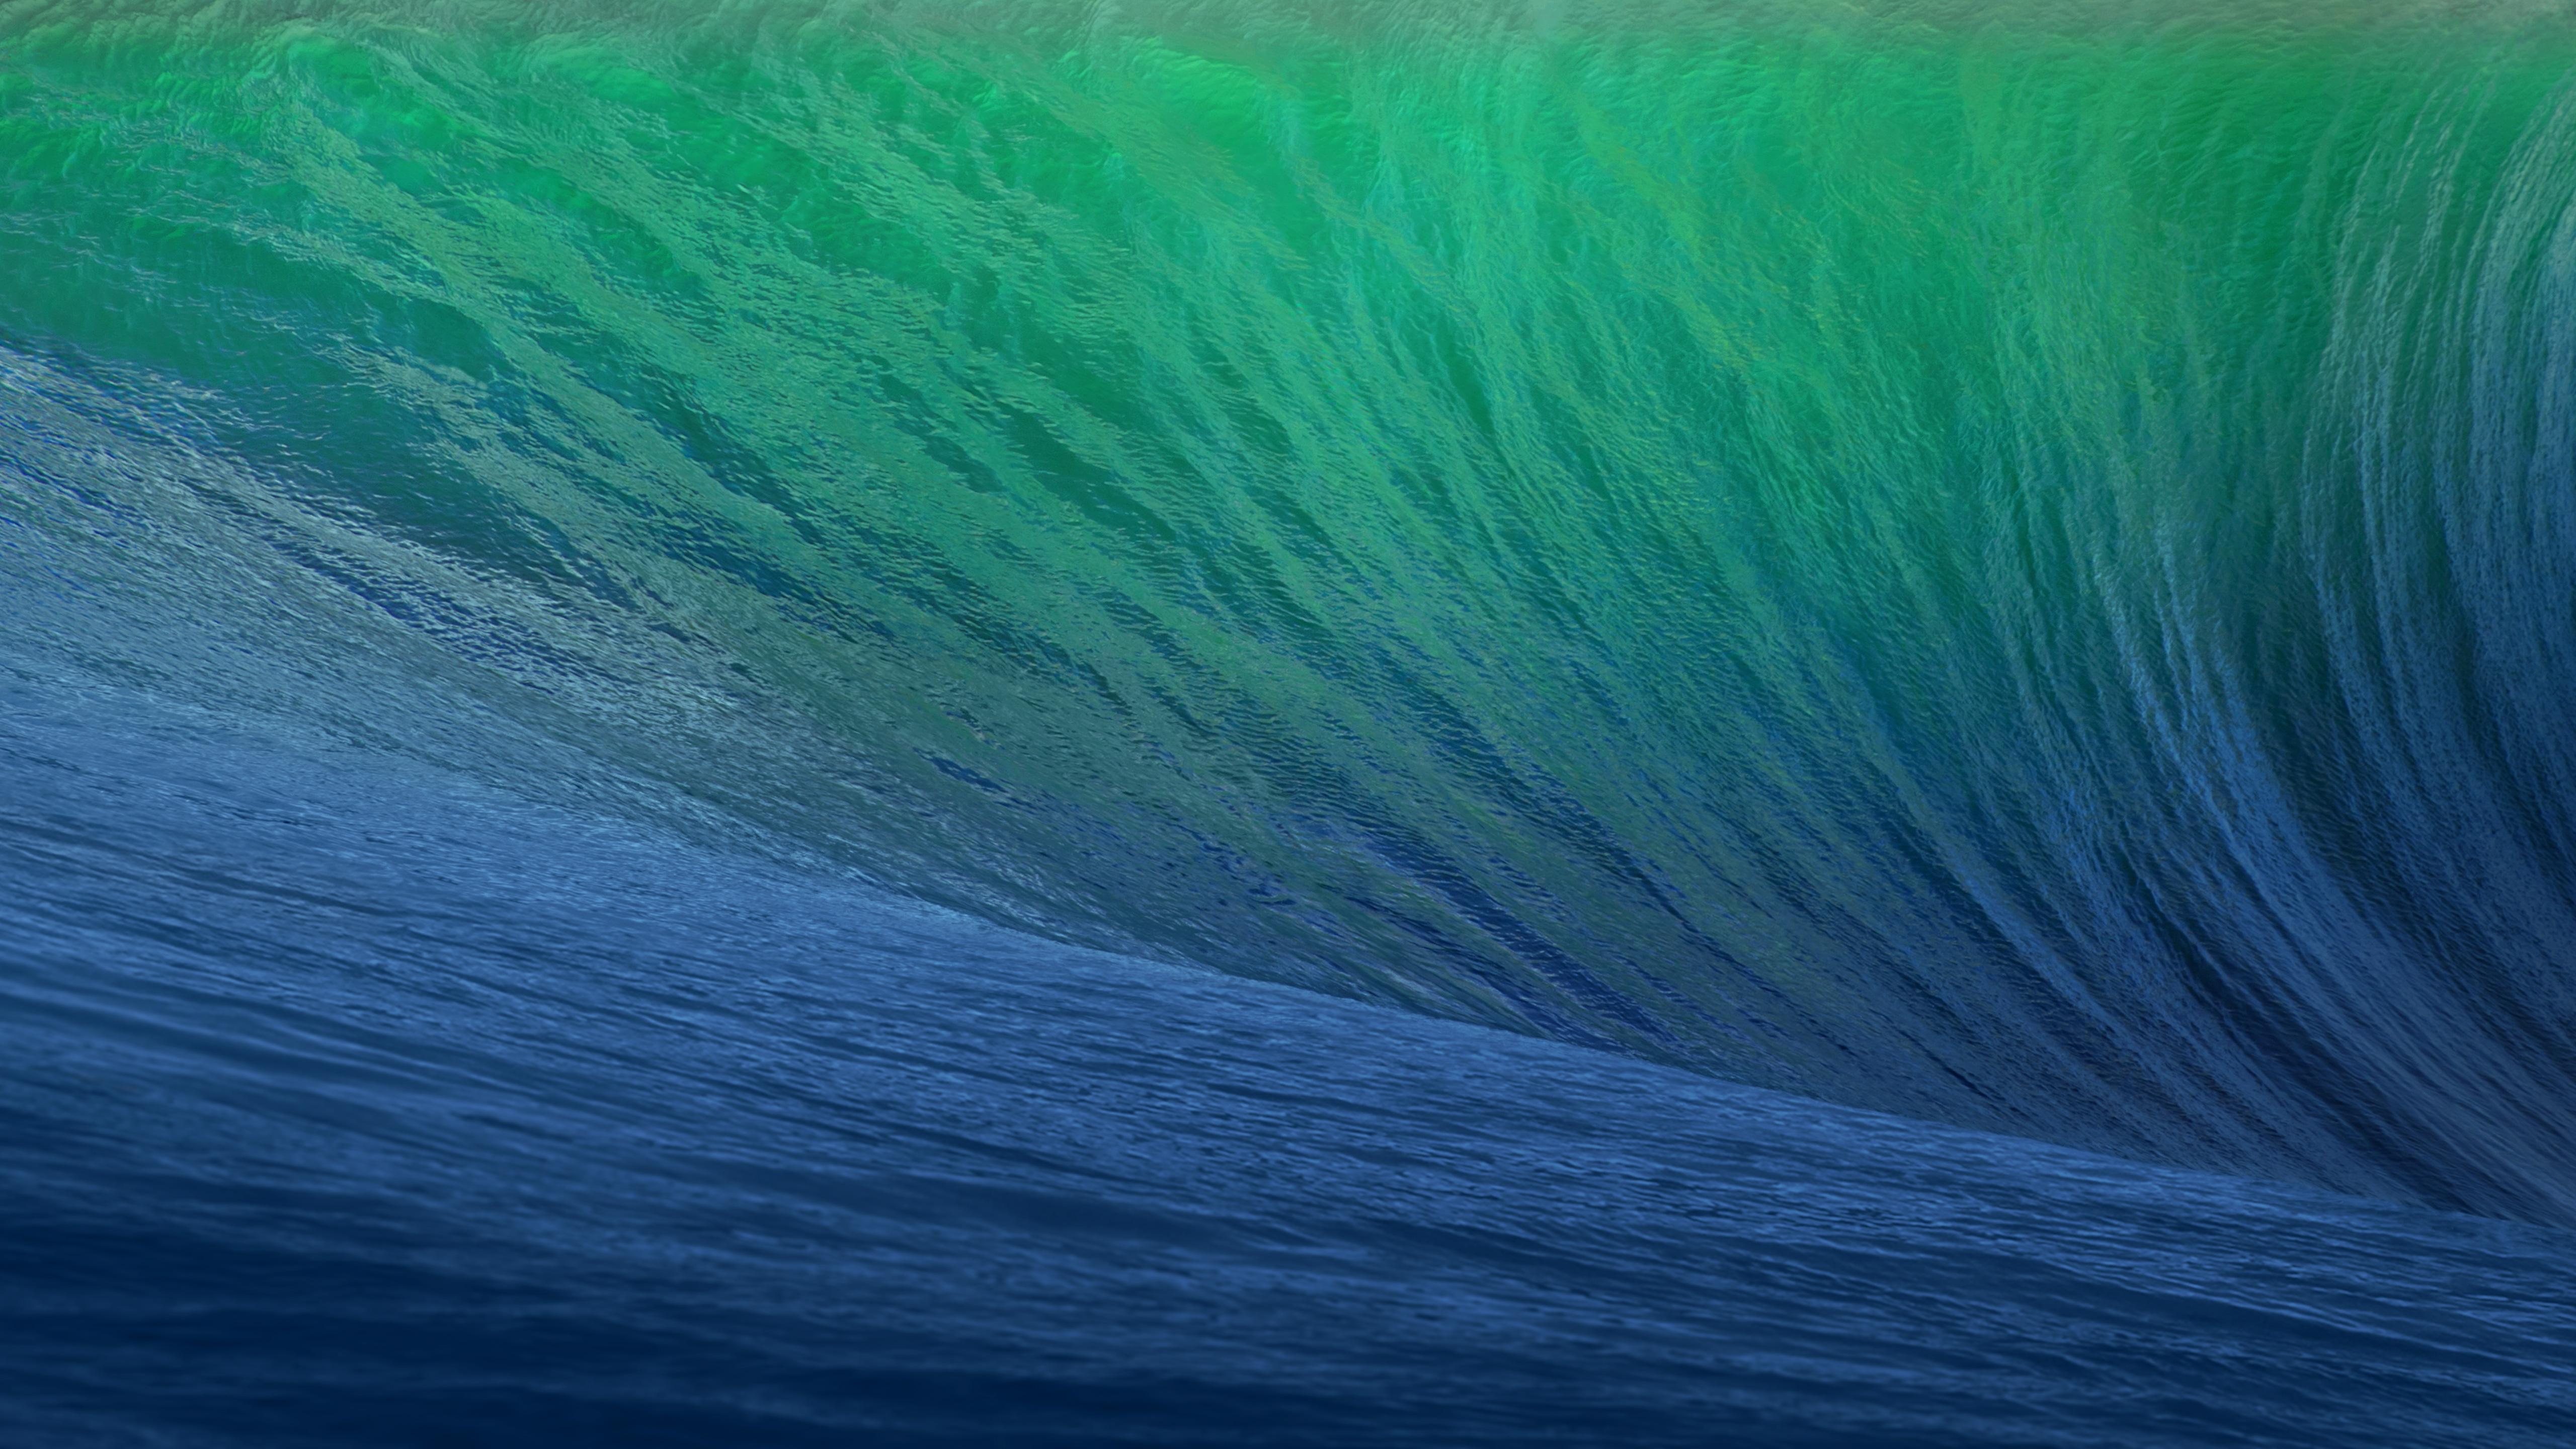 5K Apple Retina Displays Coming? New Wallpaper for OS X 10.9 ...